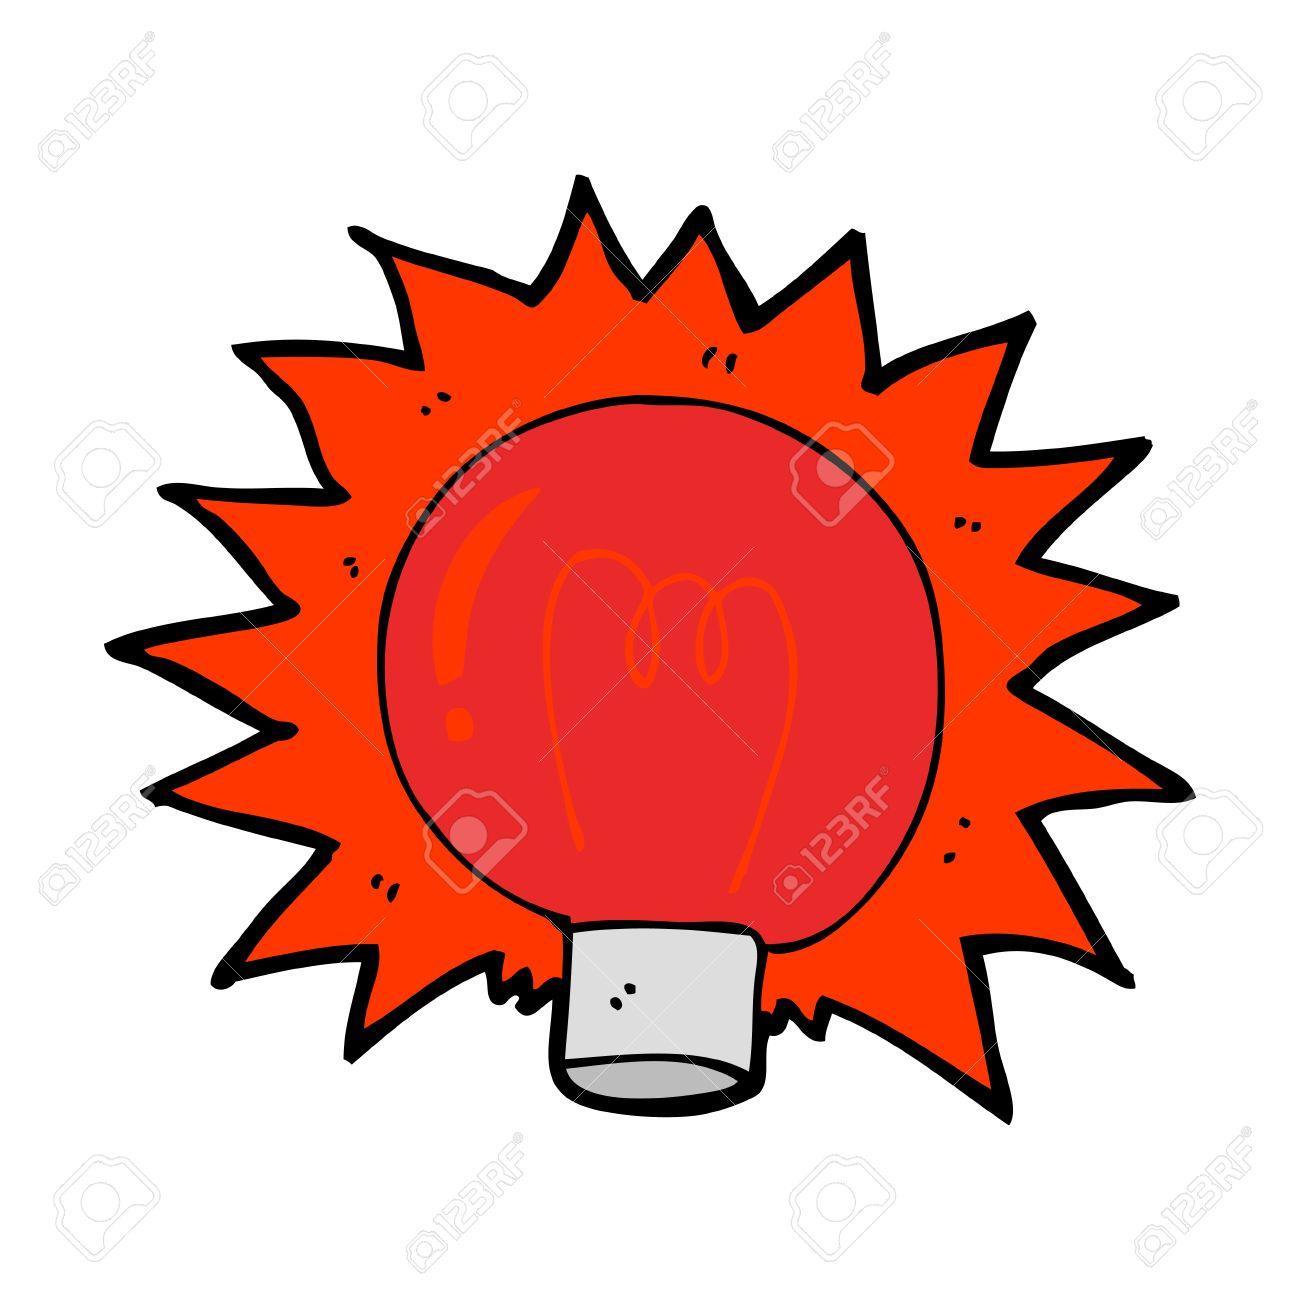 Cartoon Flashing Red Light Bulb Royalty Free Cliparts, Vectors ...